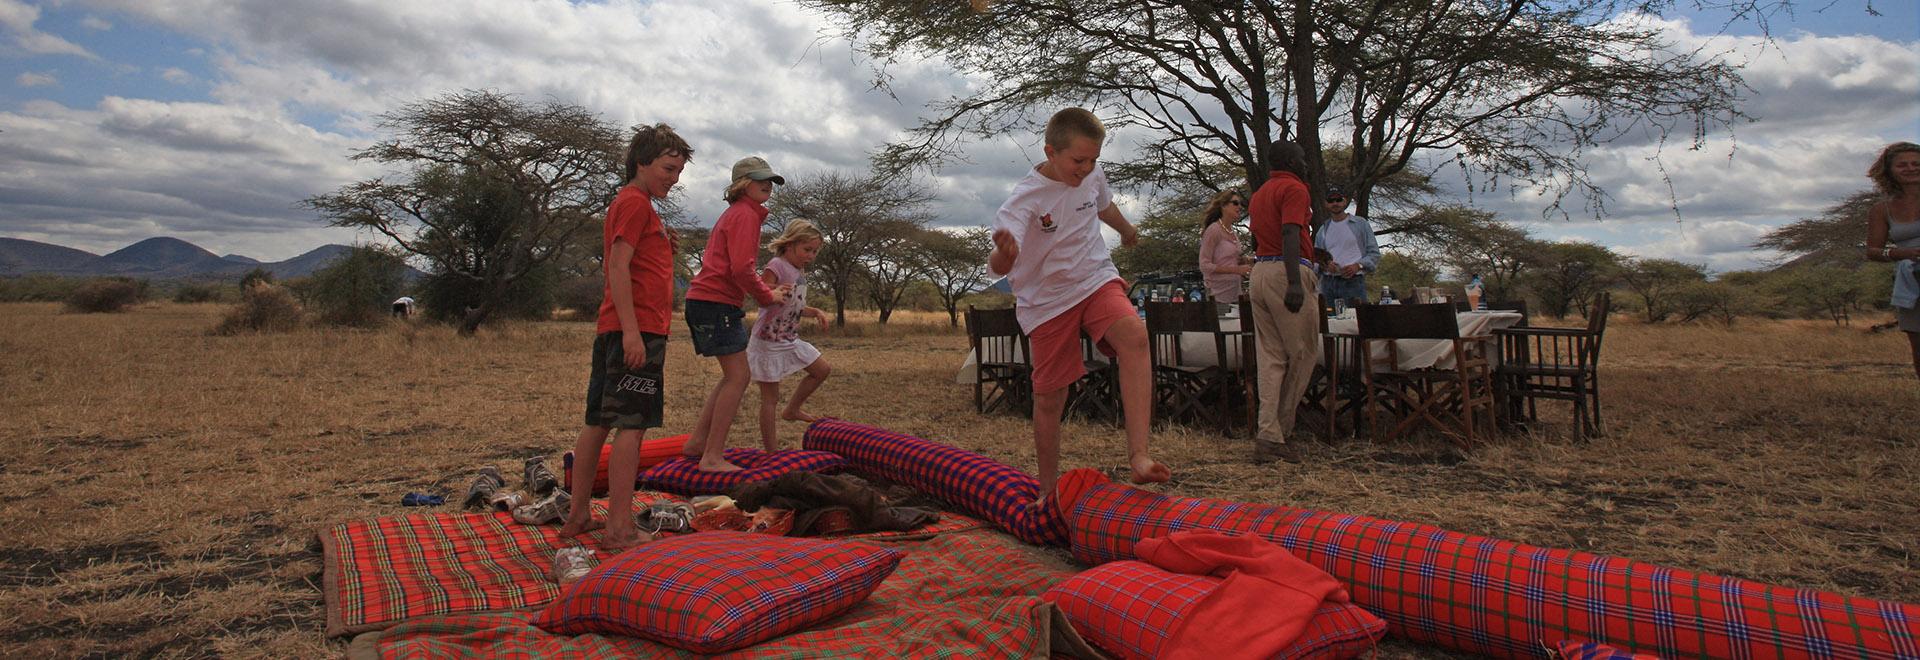 Children On An African Safari